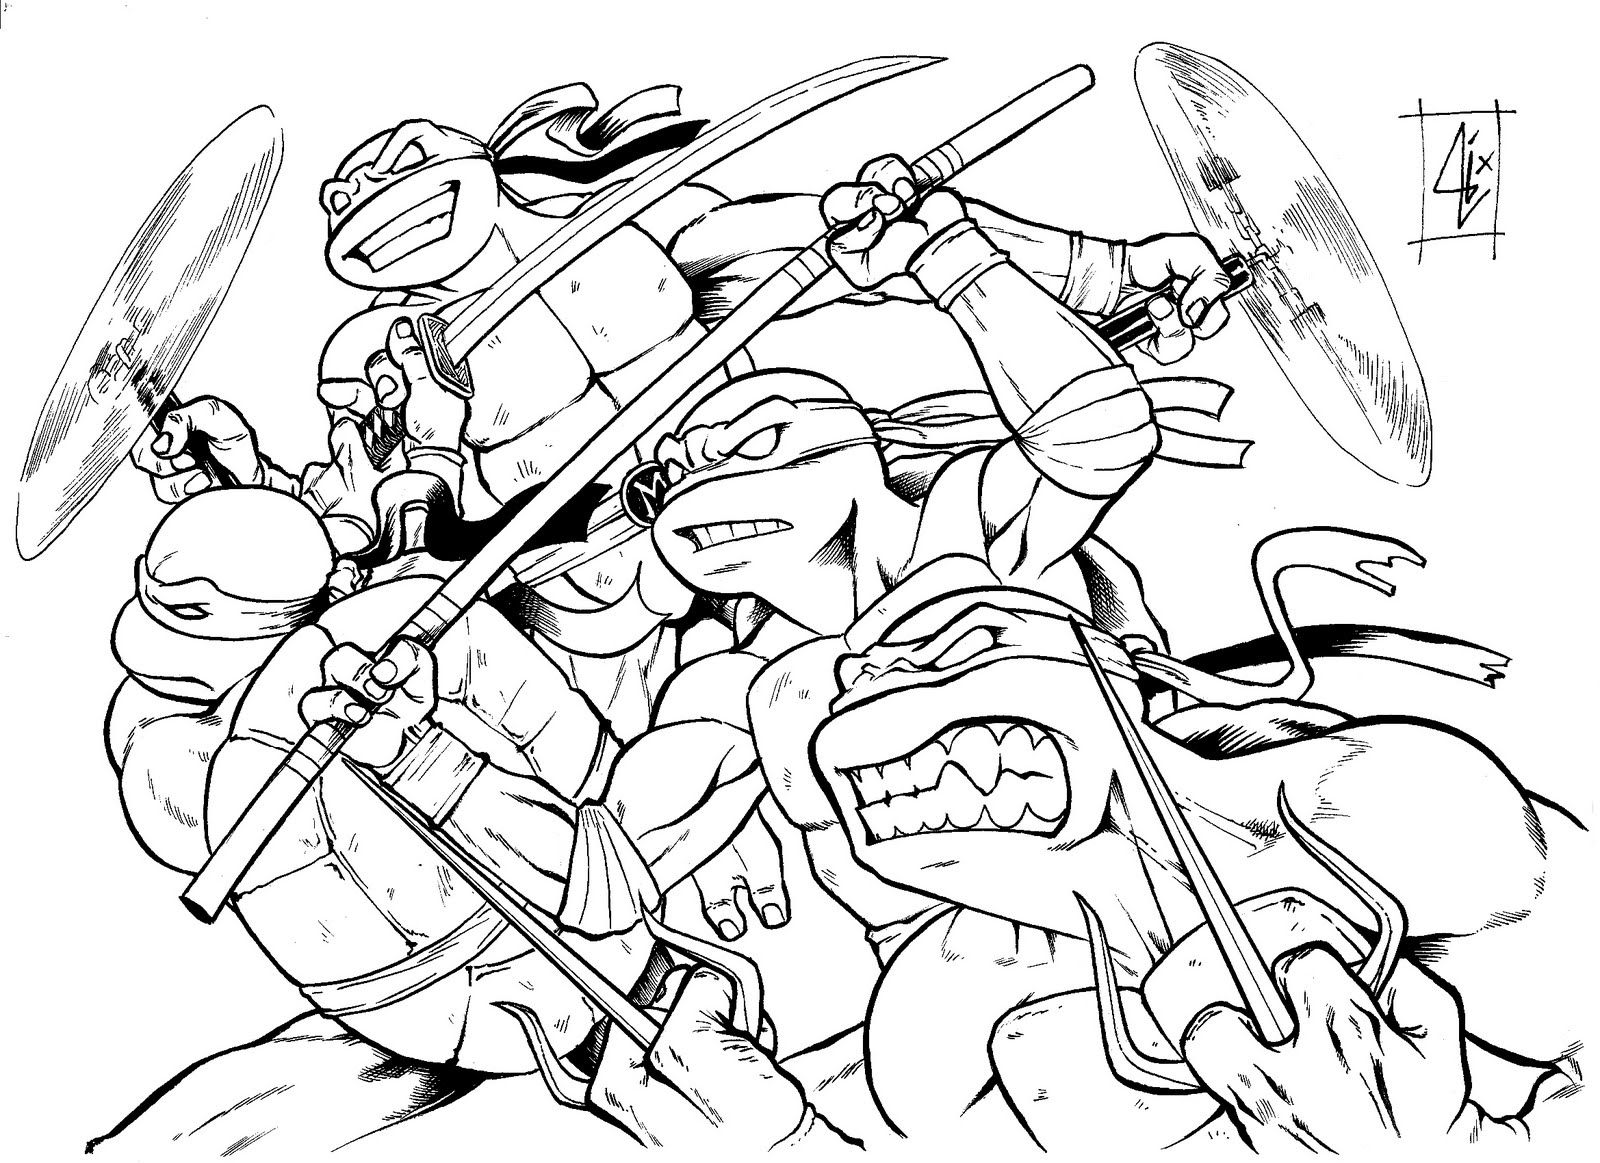 teenage mutant ninja turtles coloring pages | Coloring | Pinterest ...